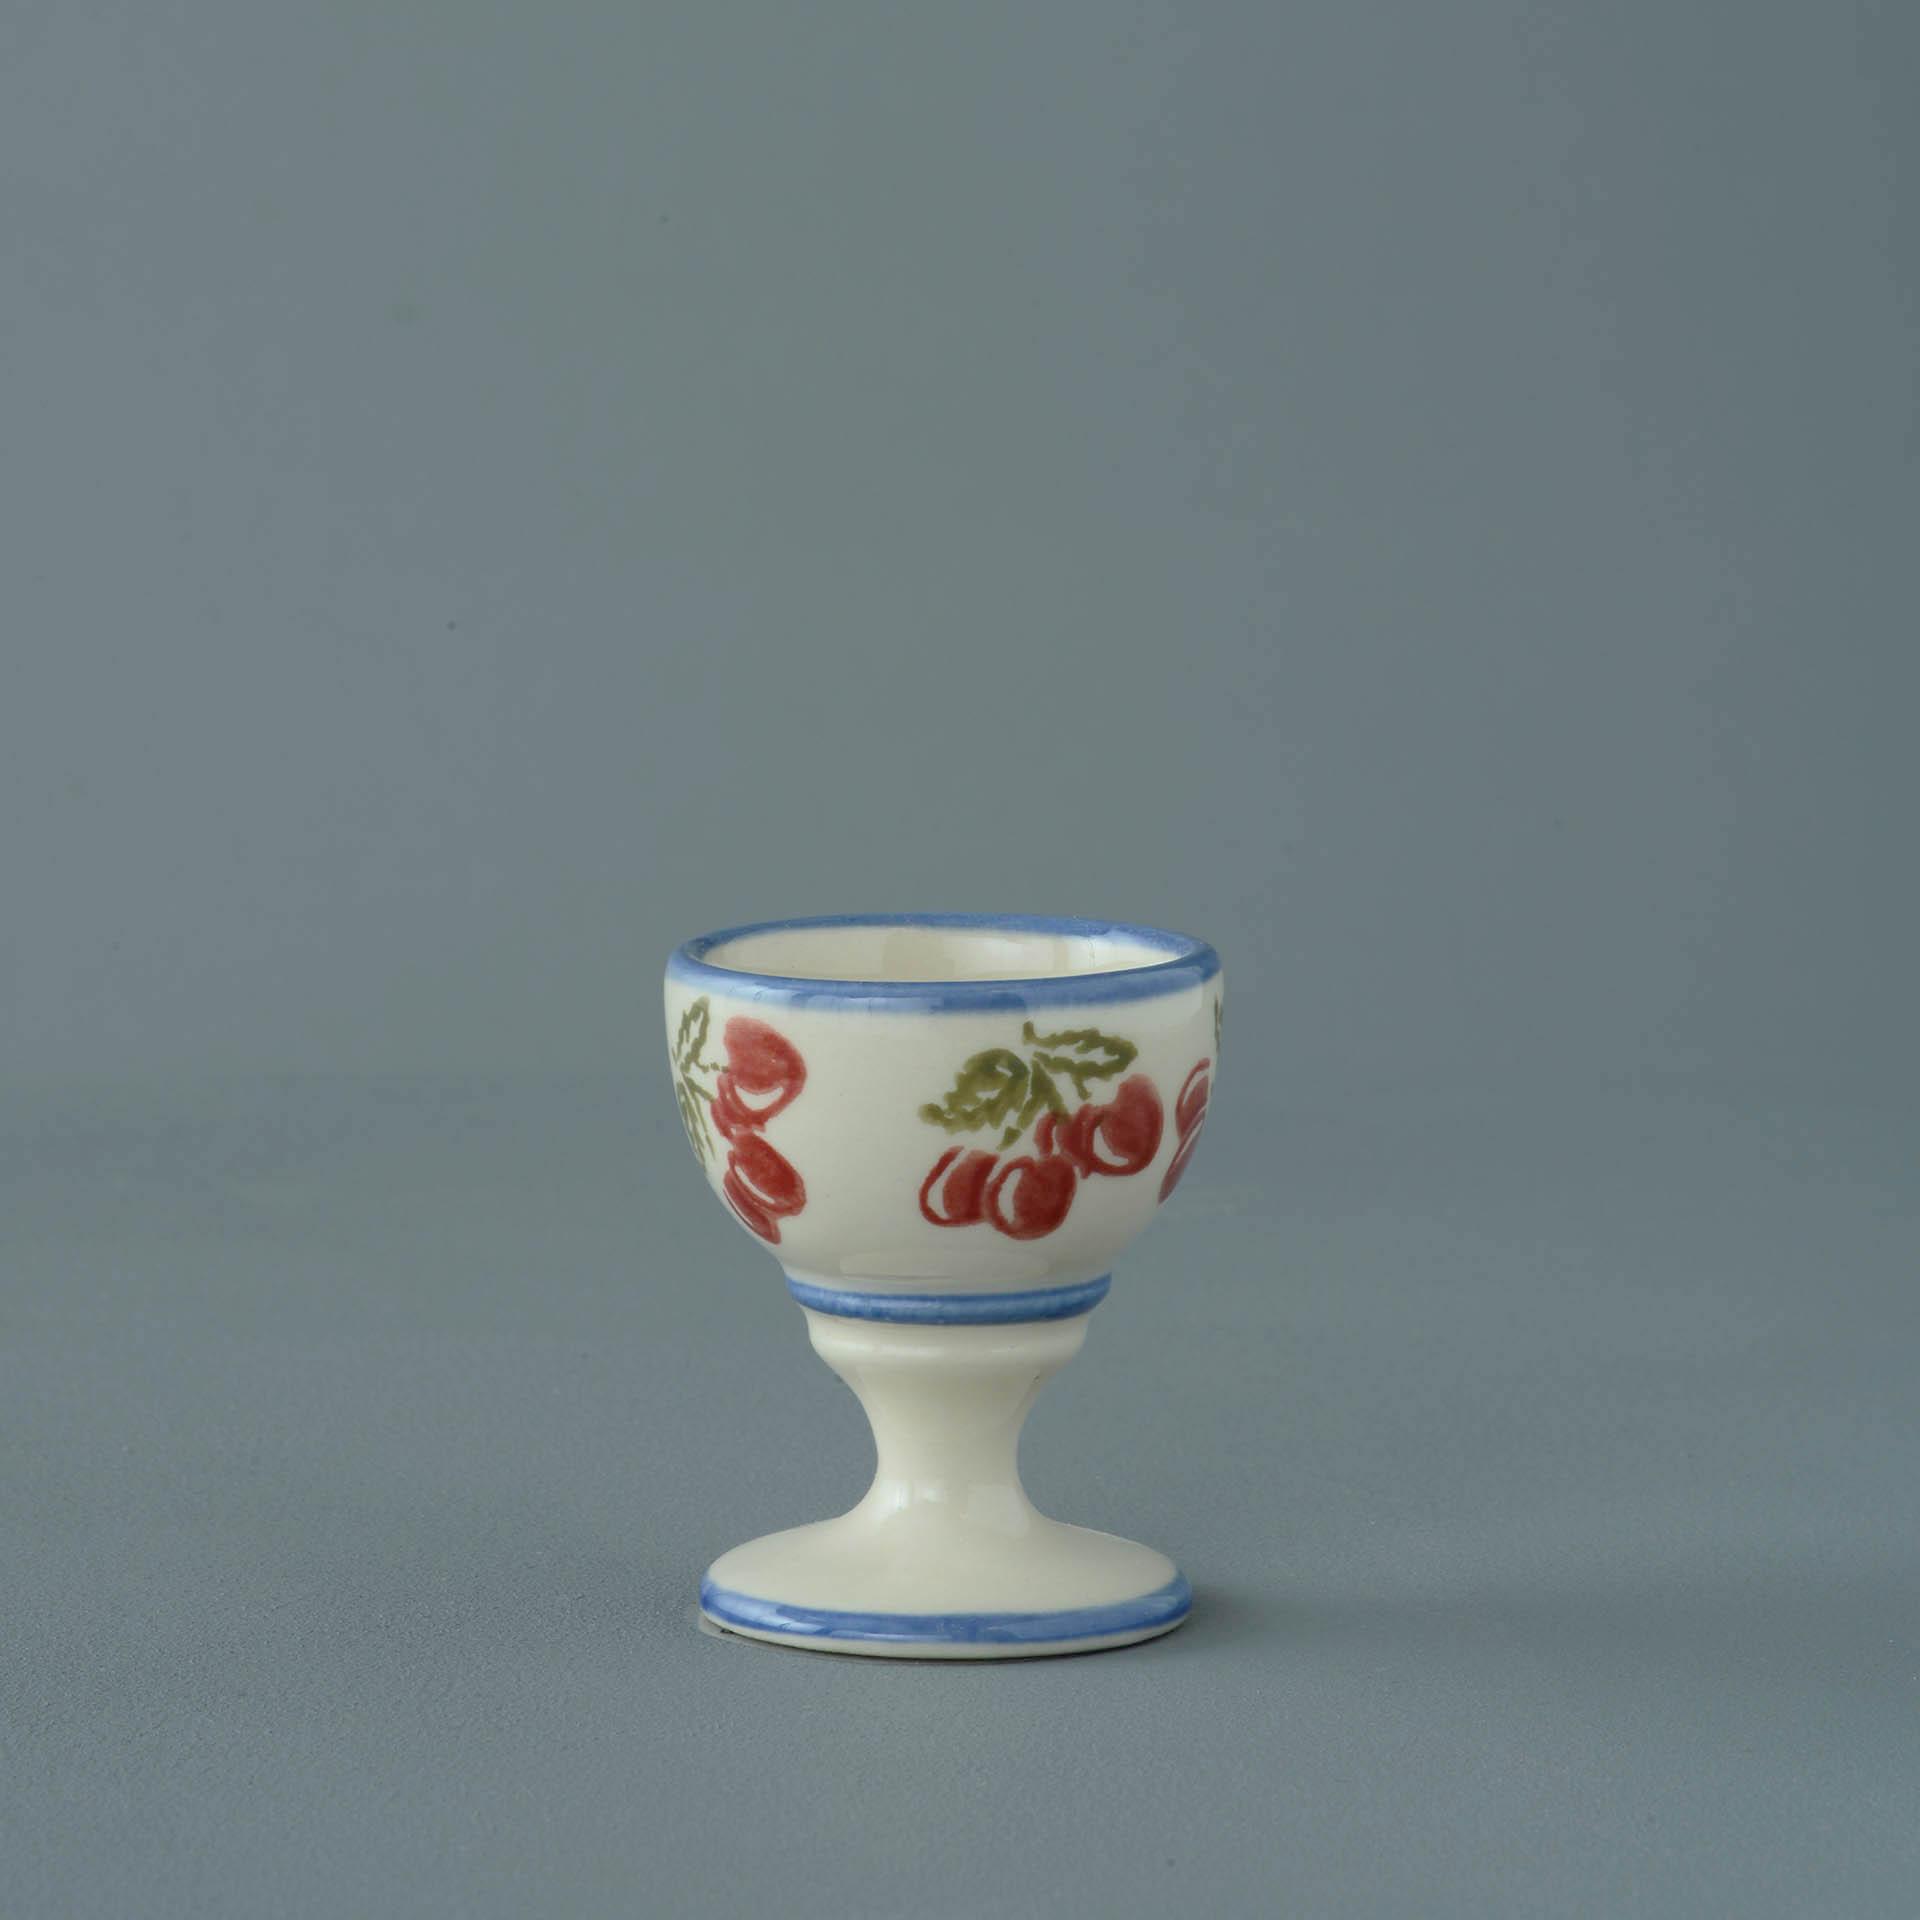 Cherries Egg cup 6.3 x 5.2cm